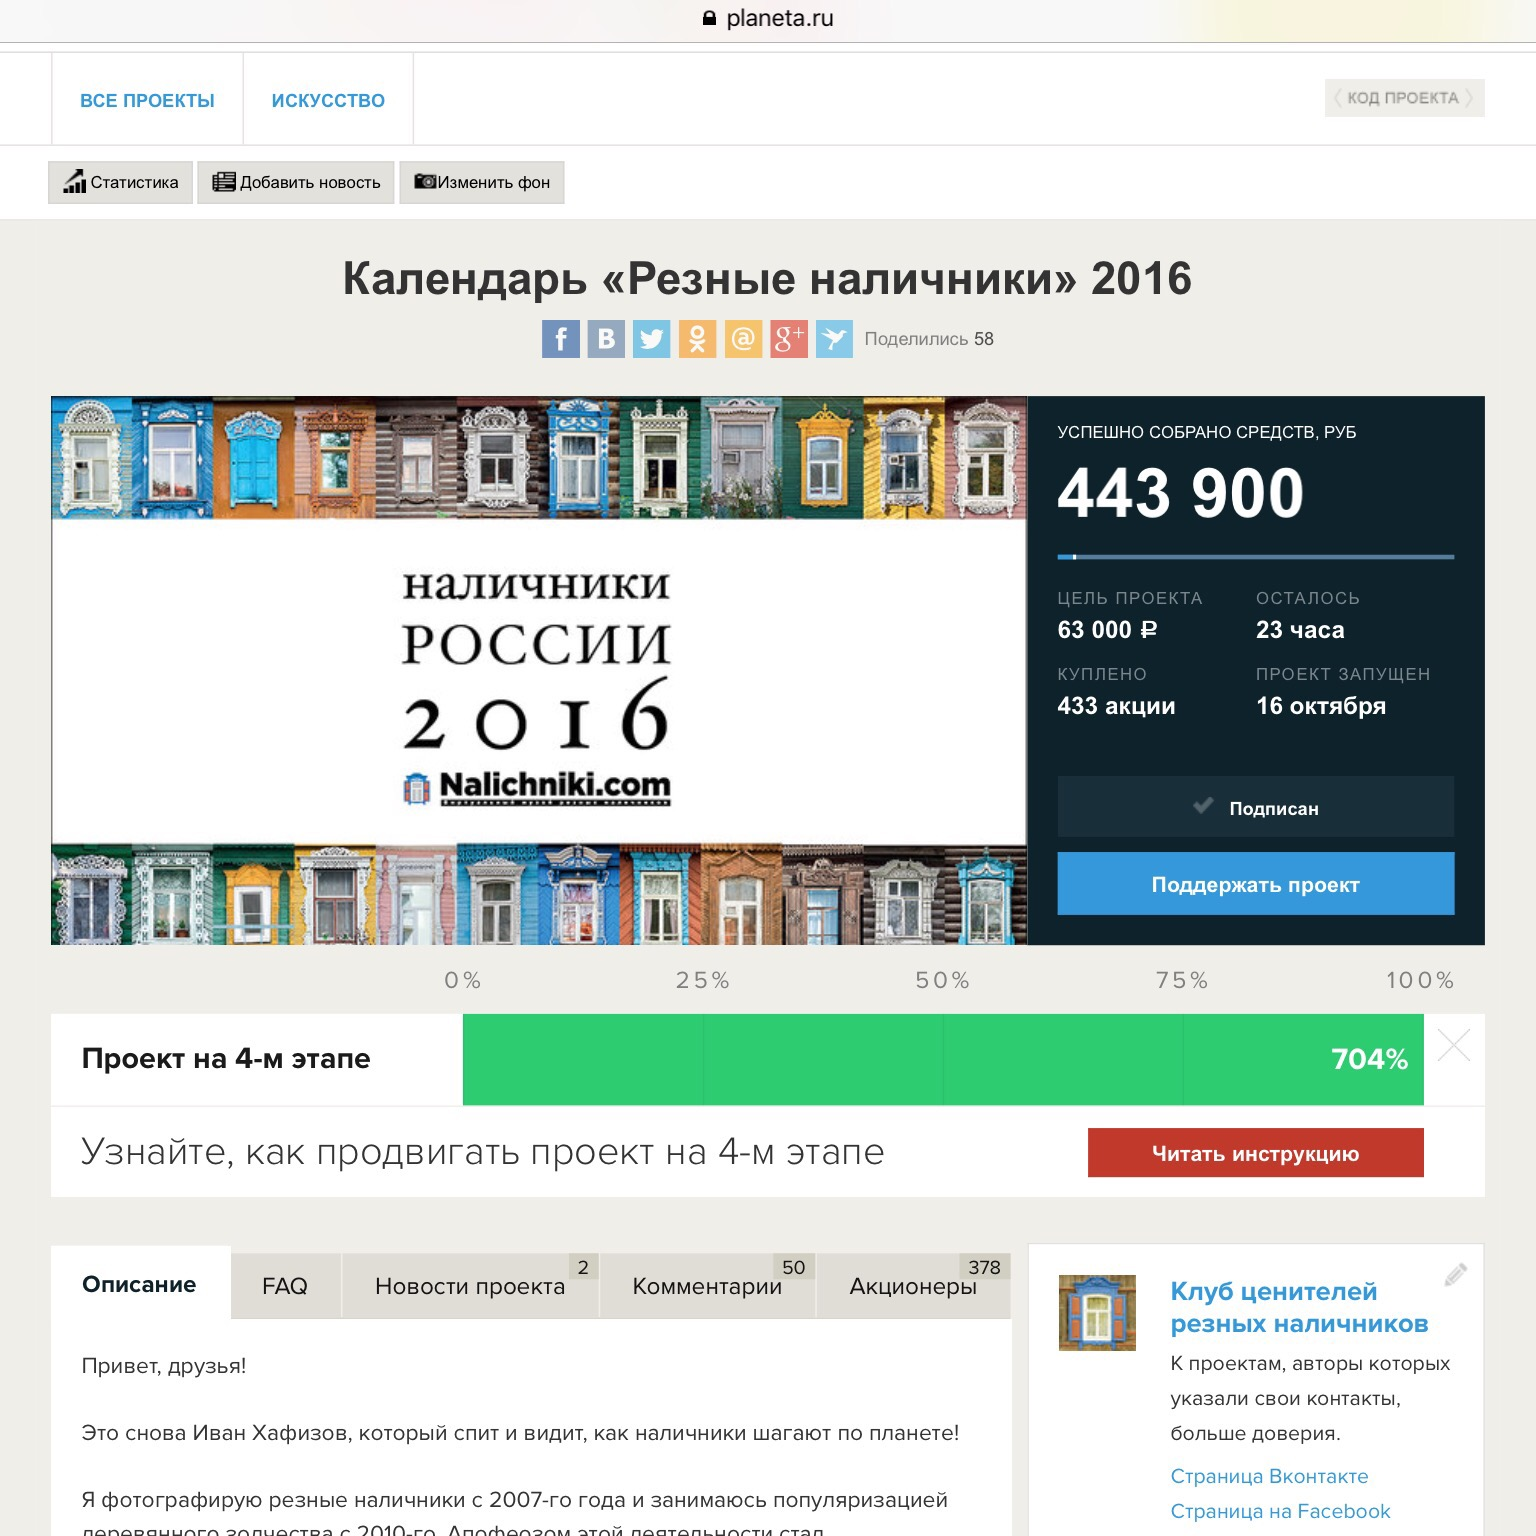 рекордный сбор на Планете.ру 700%